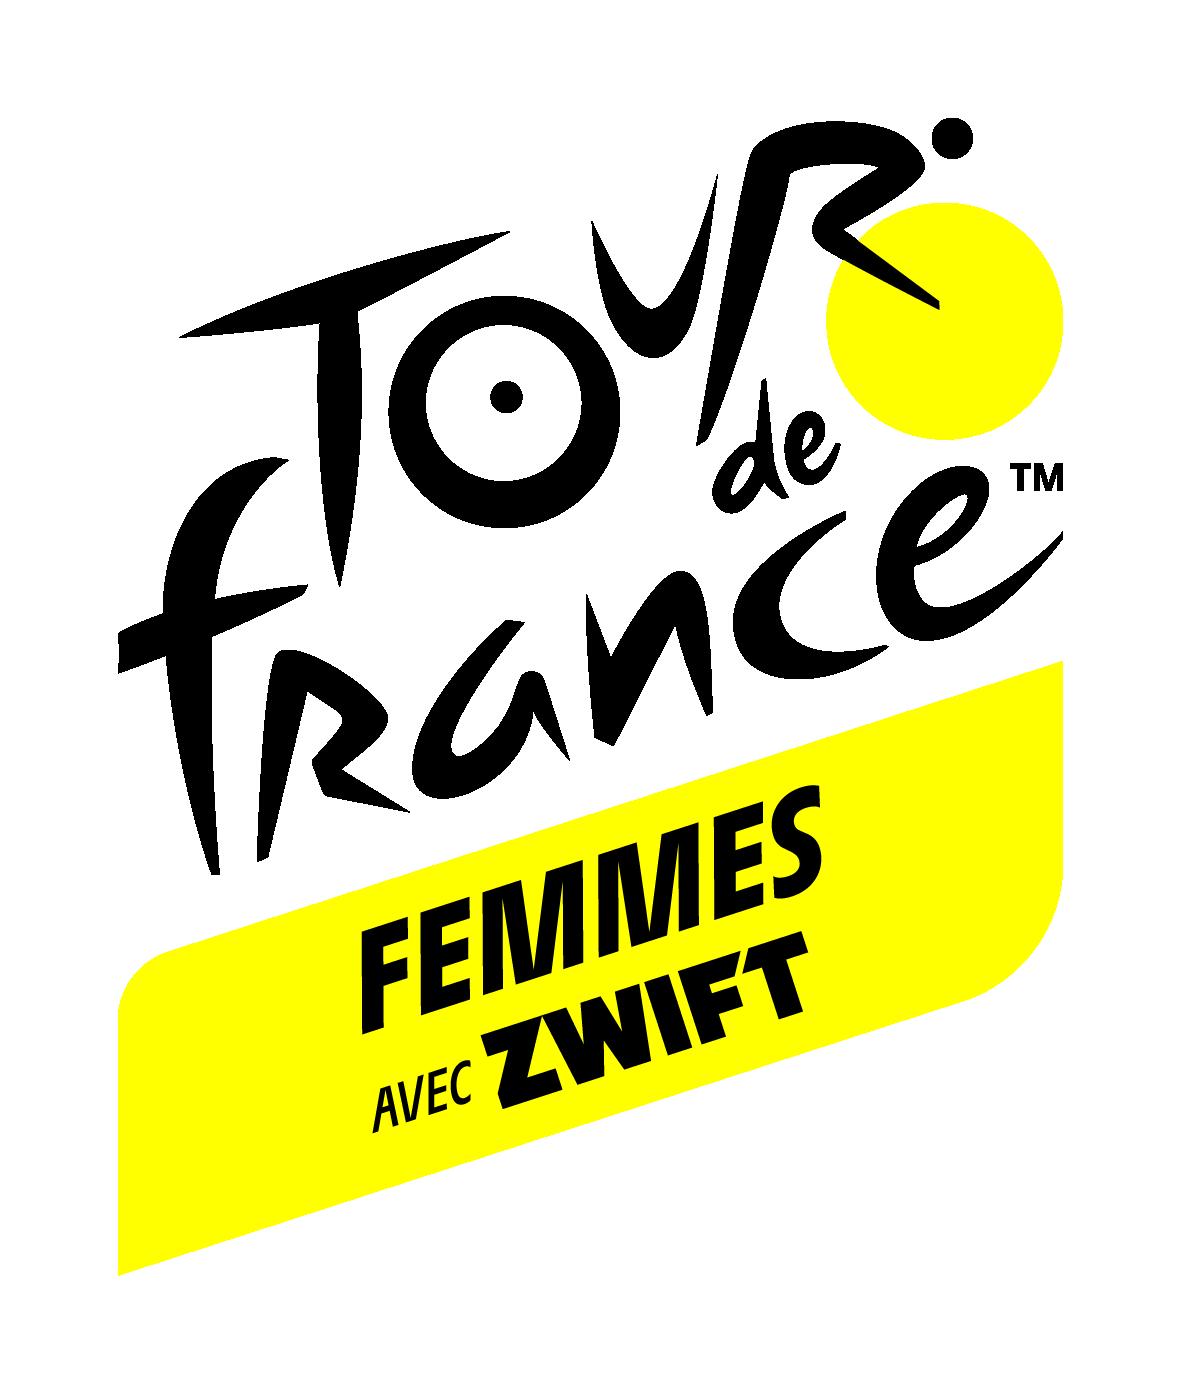 TDF-GD_Femmes-Zwift-Logo-White_background-RGB.png